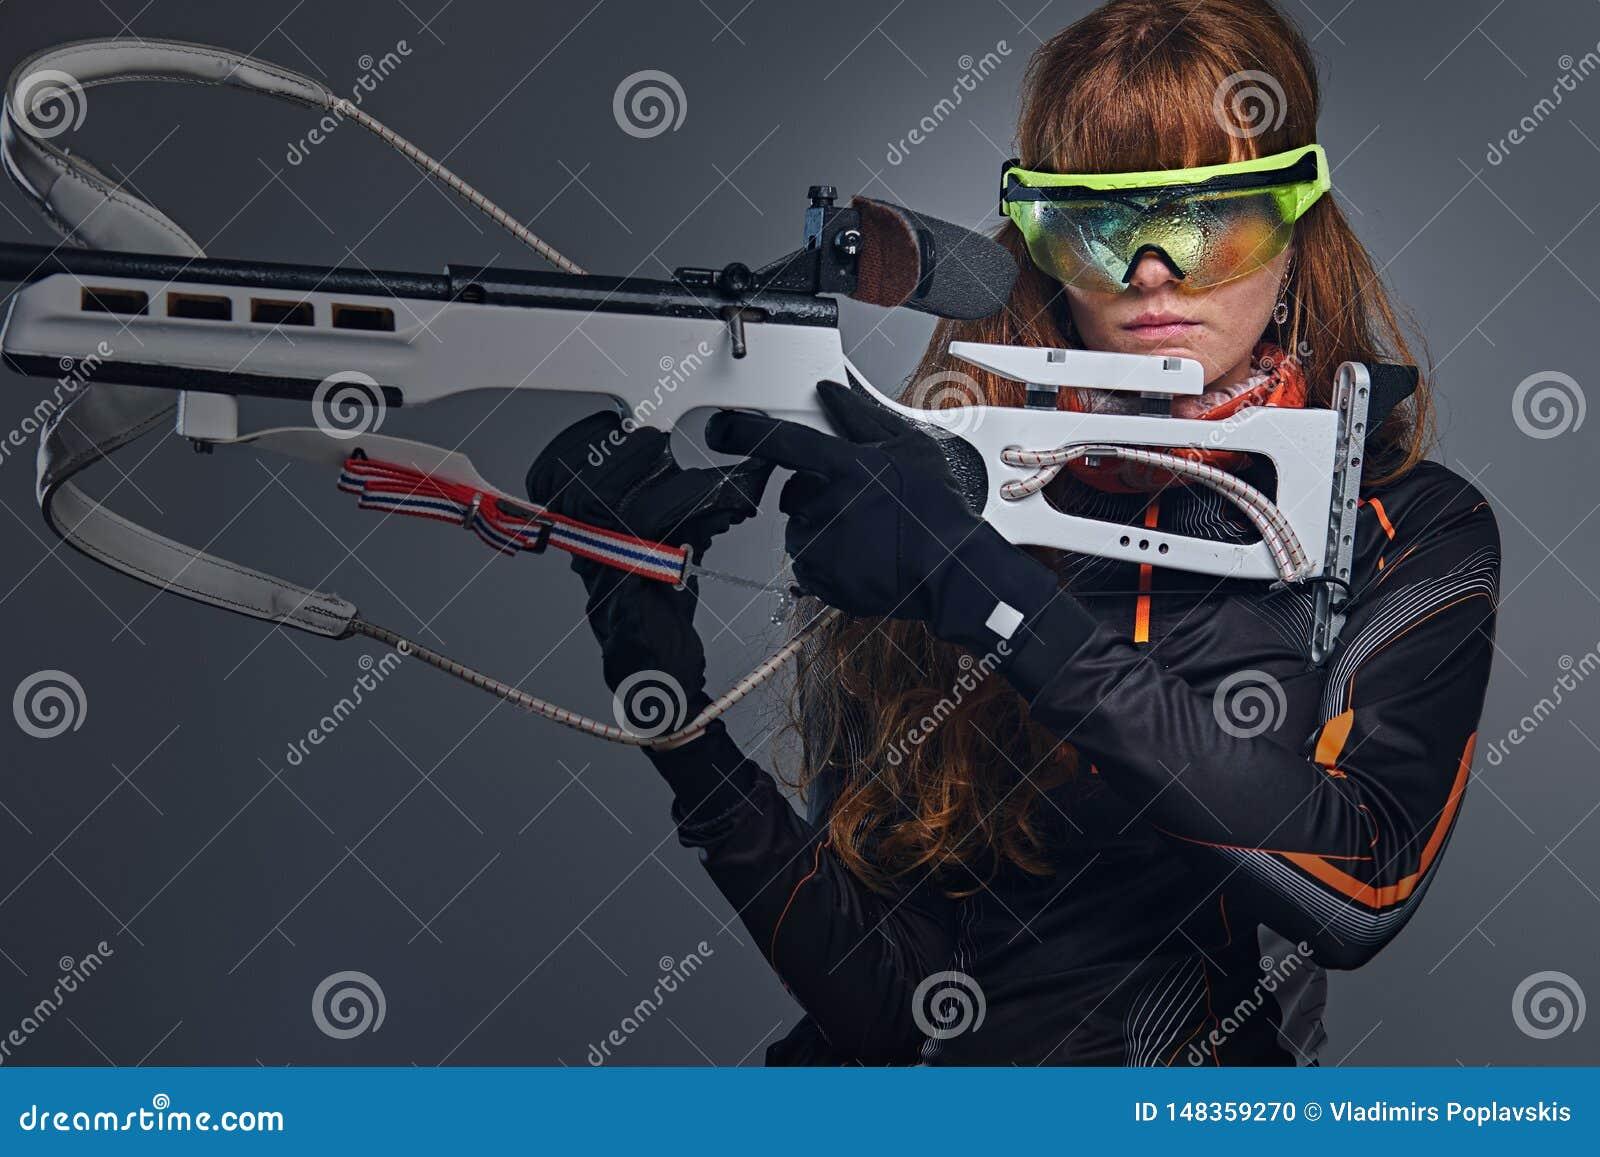 H?ll f?r r?dh?rig manBiatlon konkurrenskraftigt vapen f?r kvinnliga idrottsm?n